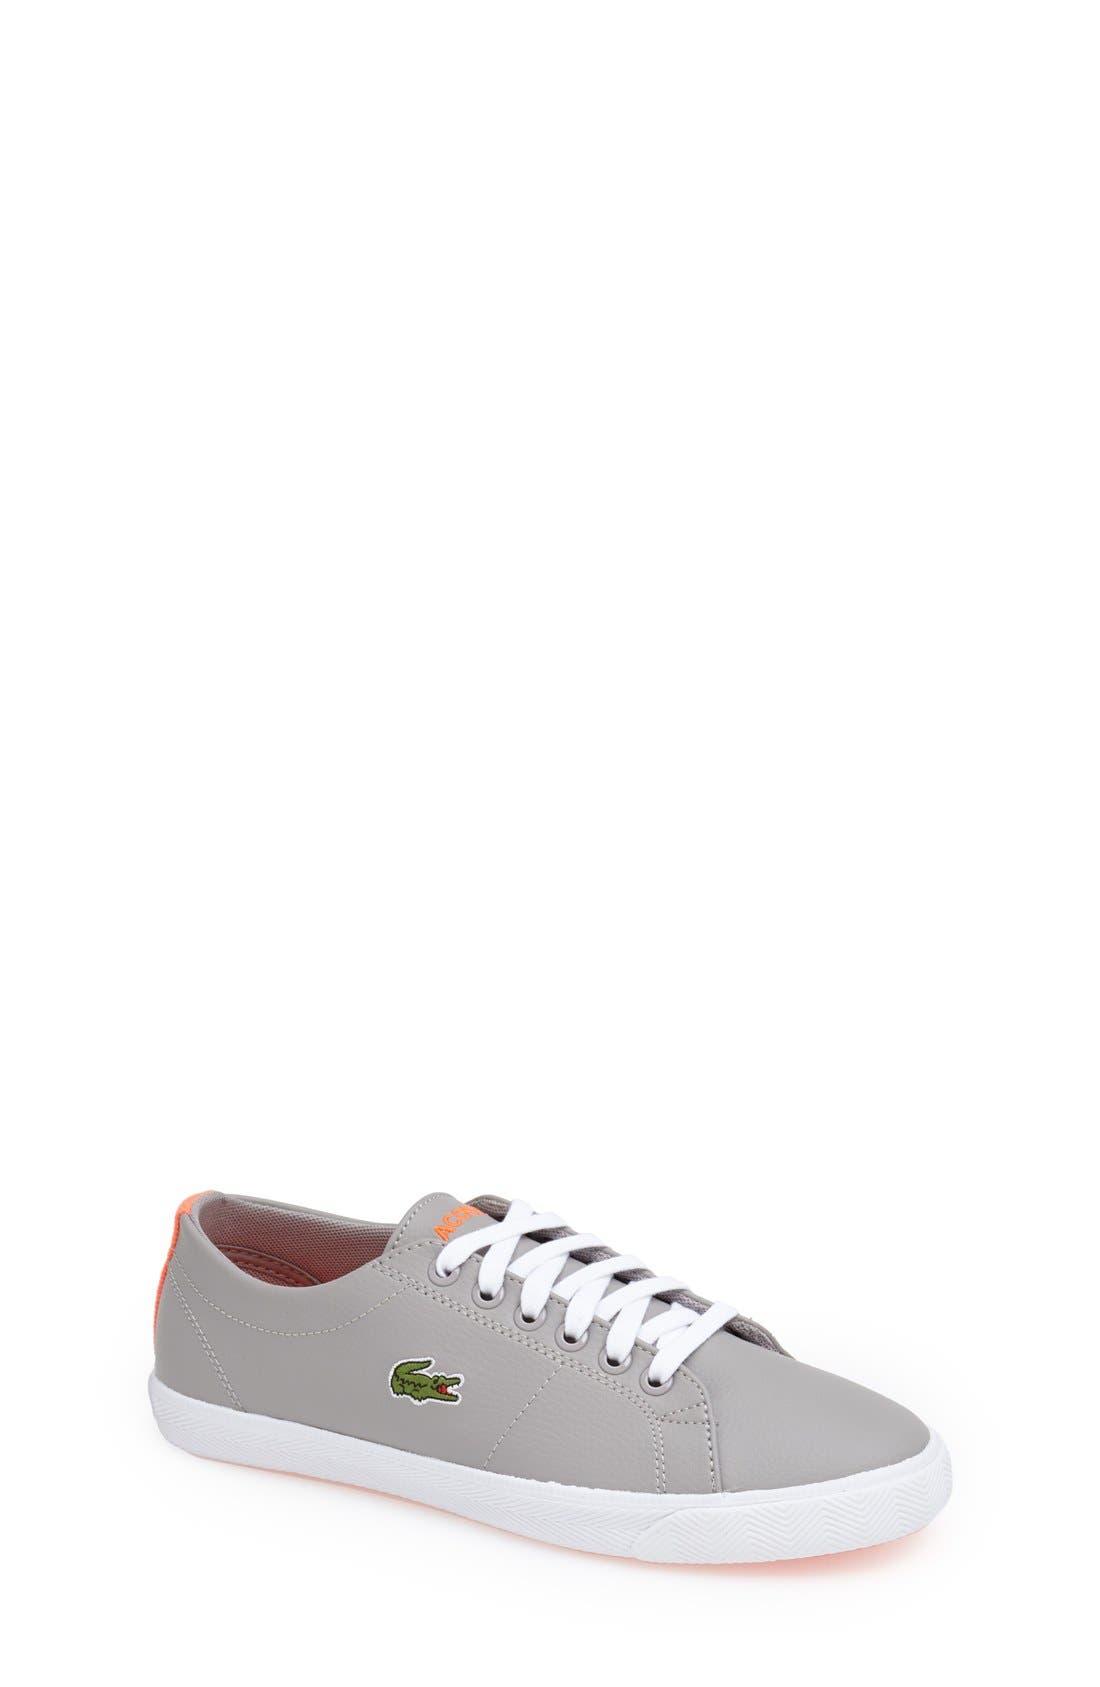 Main Image - Lacoste 'Marcel' Sneaker (Toddler, Little Kid & Big Kid)